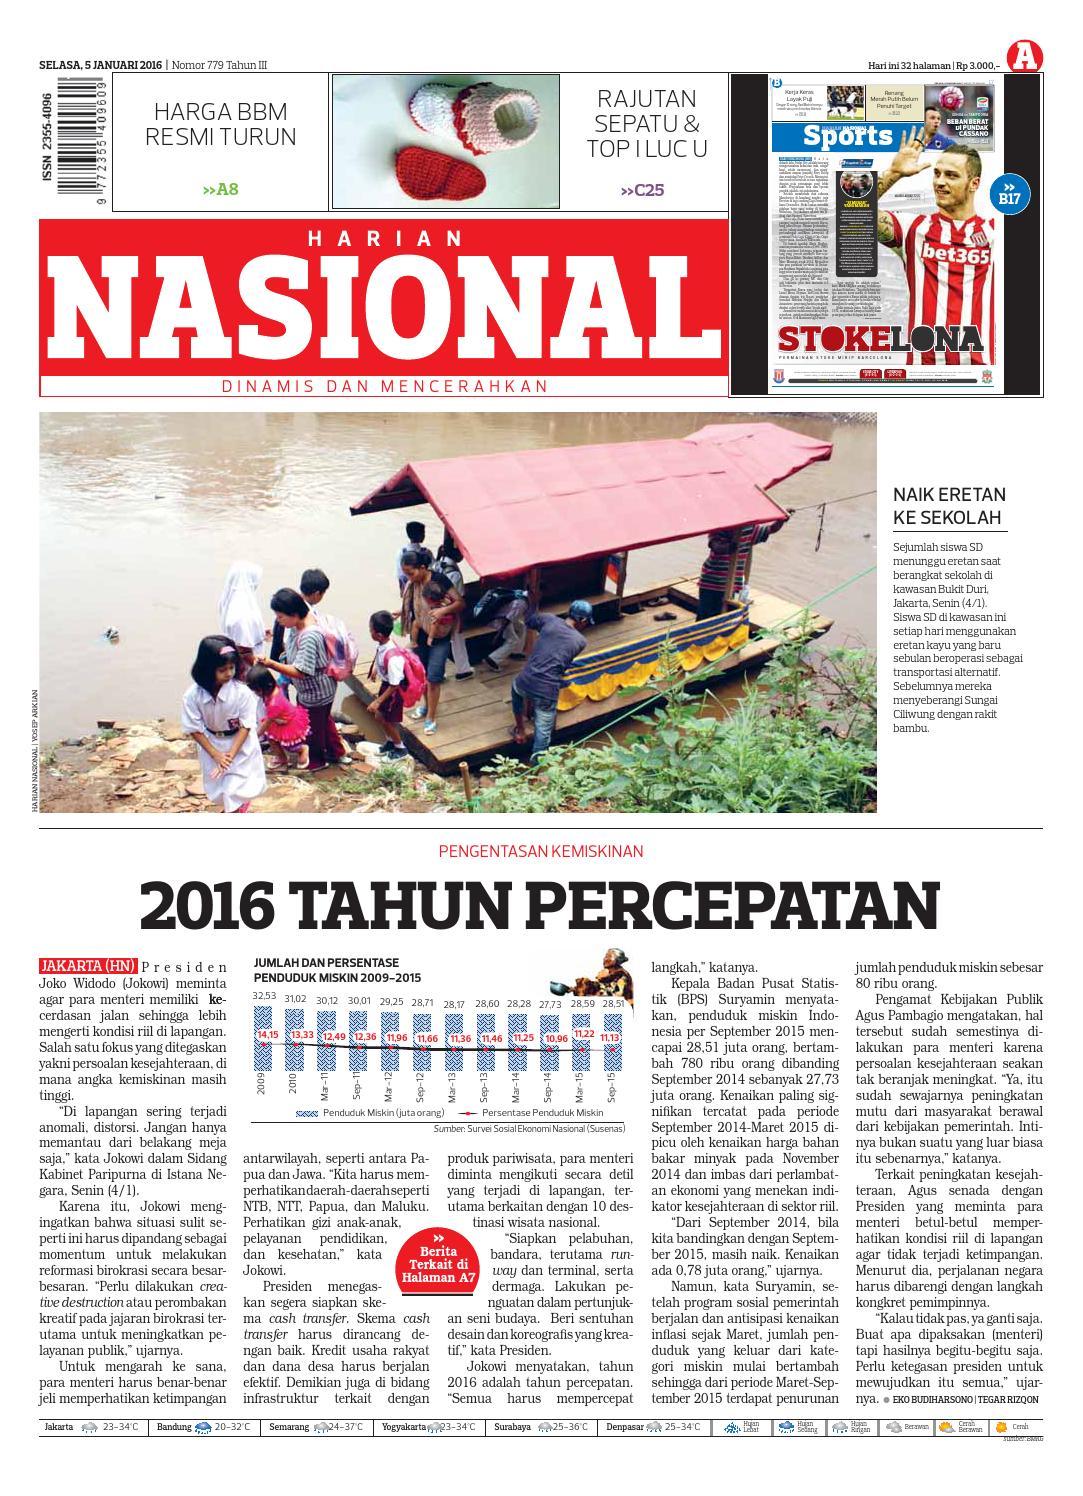 Harian Nasional By Issuu Produk Ukm Bumn Tas Ransel Threepoint